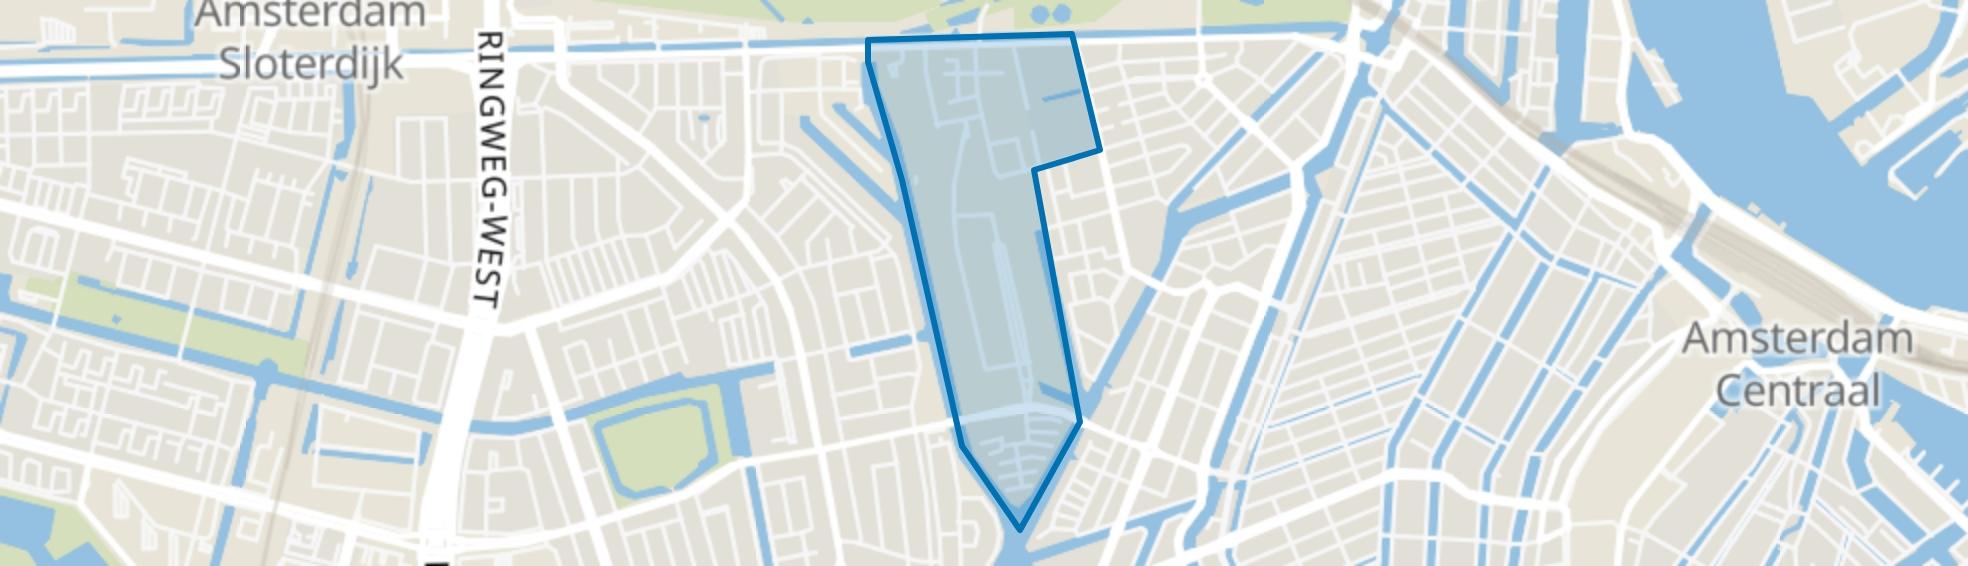 Centrale Markt, Amsterdam map